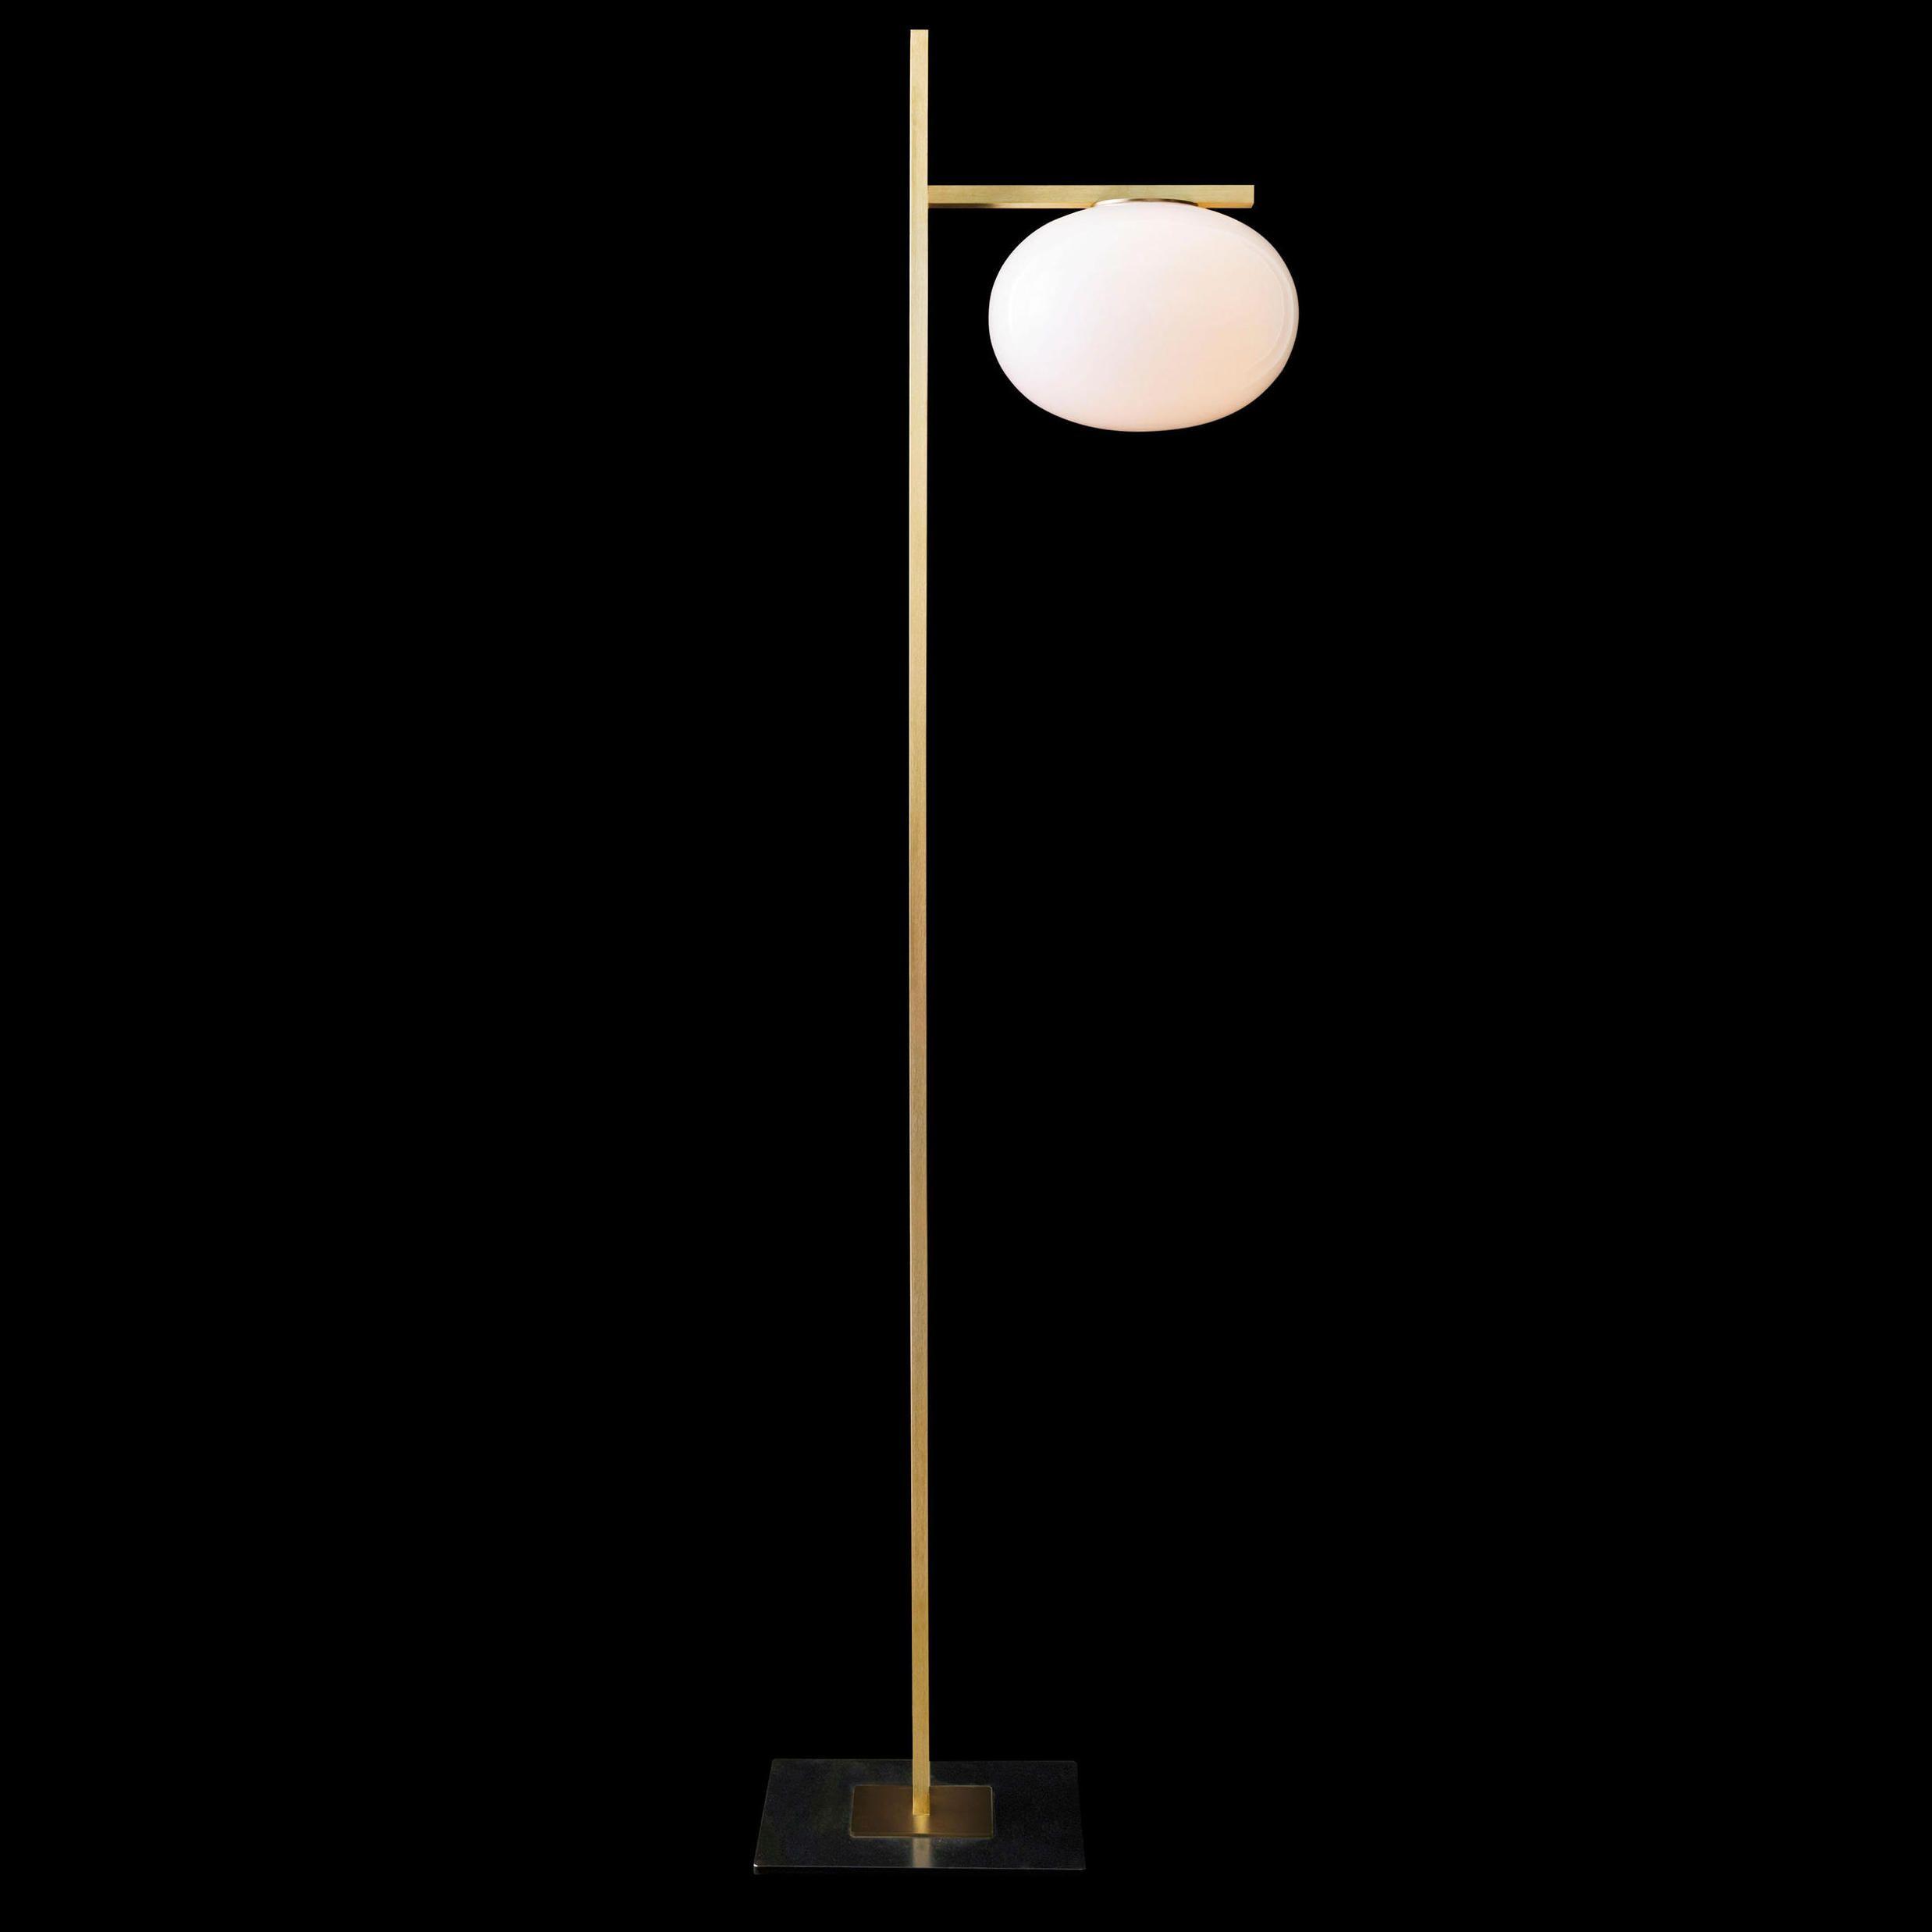 Lampadaire ALBA 382 laiton opale LED ˜28 5cm H161cm OLUCE